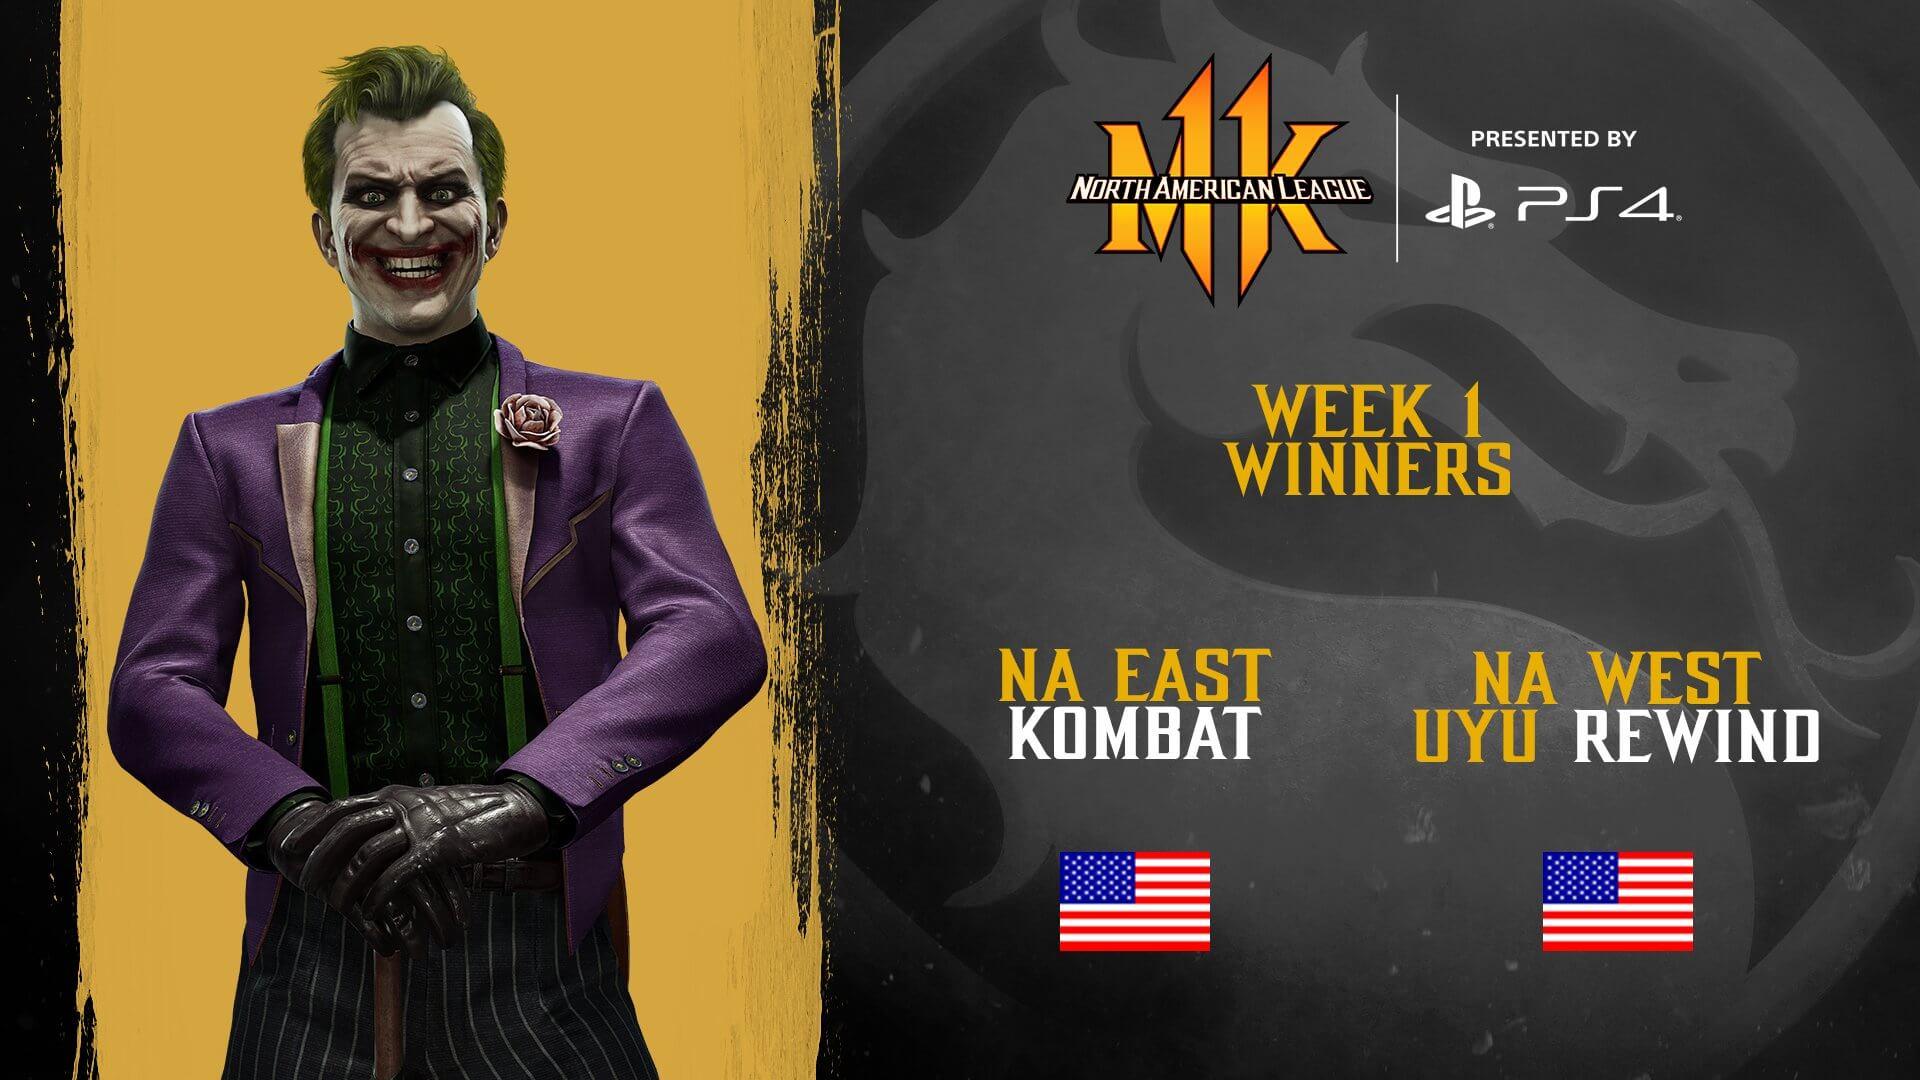 Mortal Kombat Pro Kompetition 2020: NA West & East week 1 Results